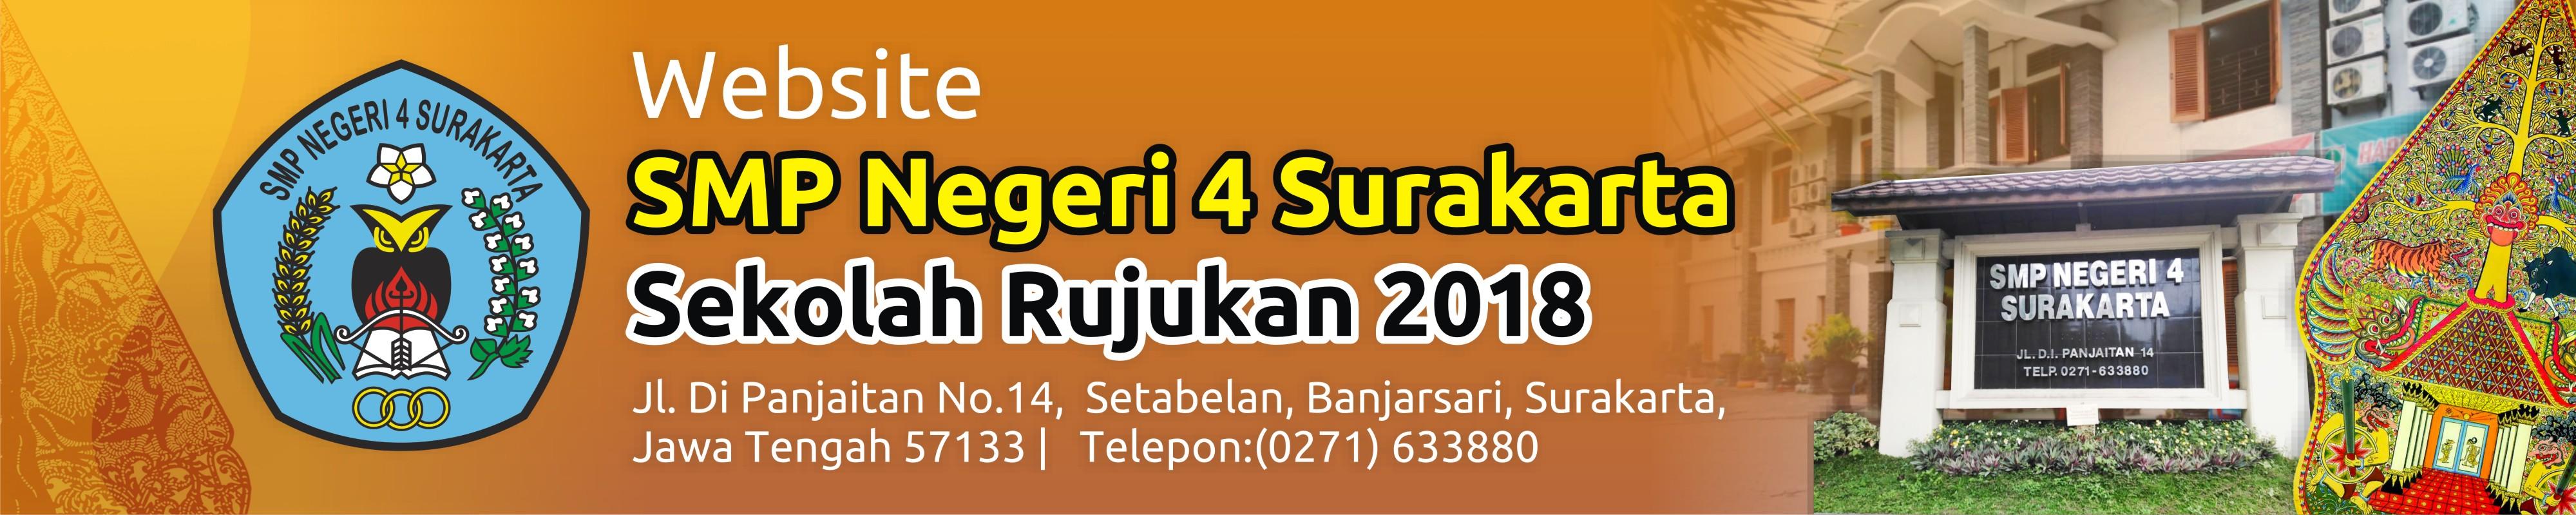 SMPN 4 Surakarta